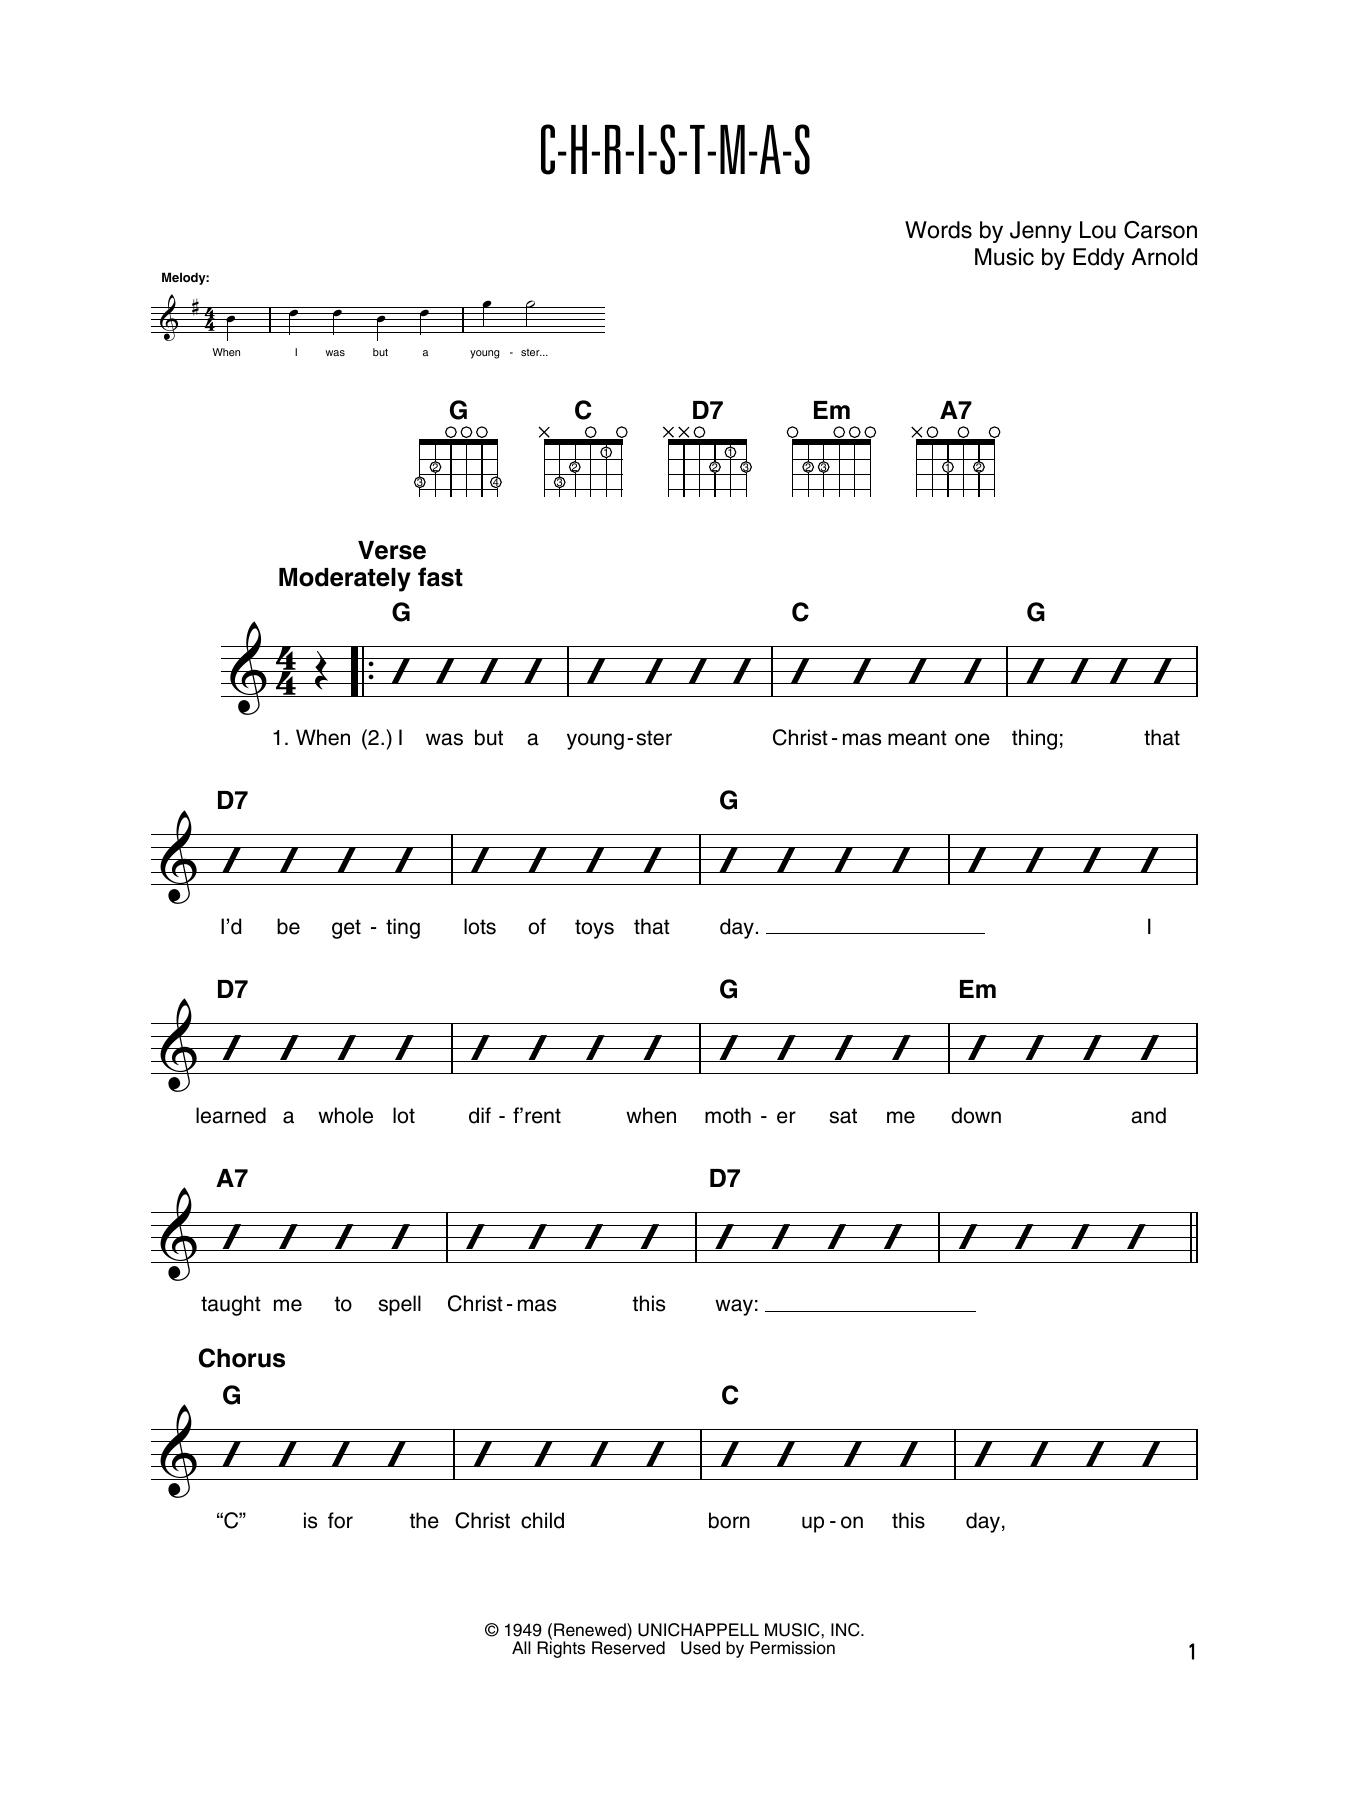 C-H-R-I-S-T-M-A-S (Guitar Tab)